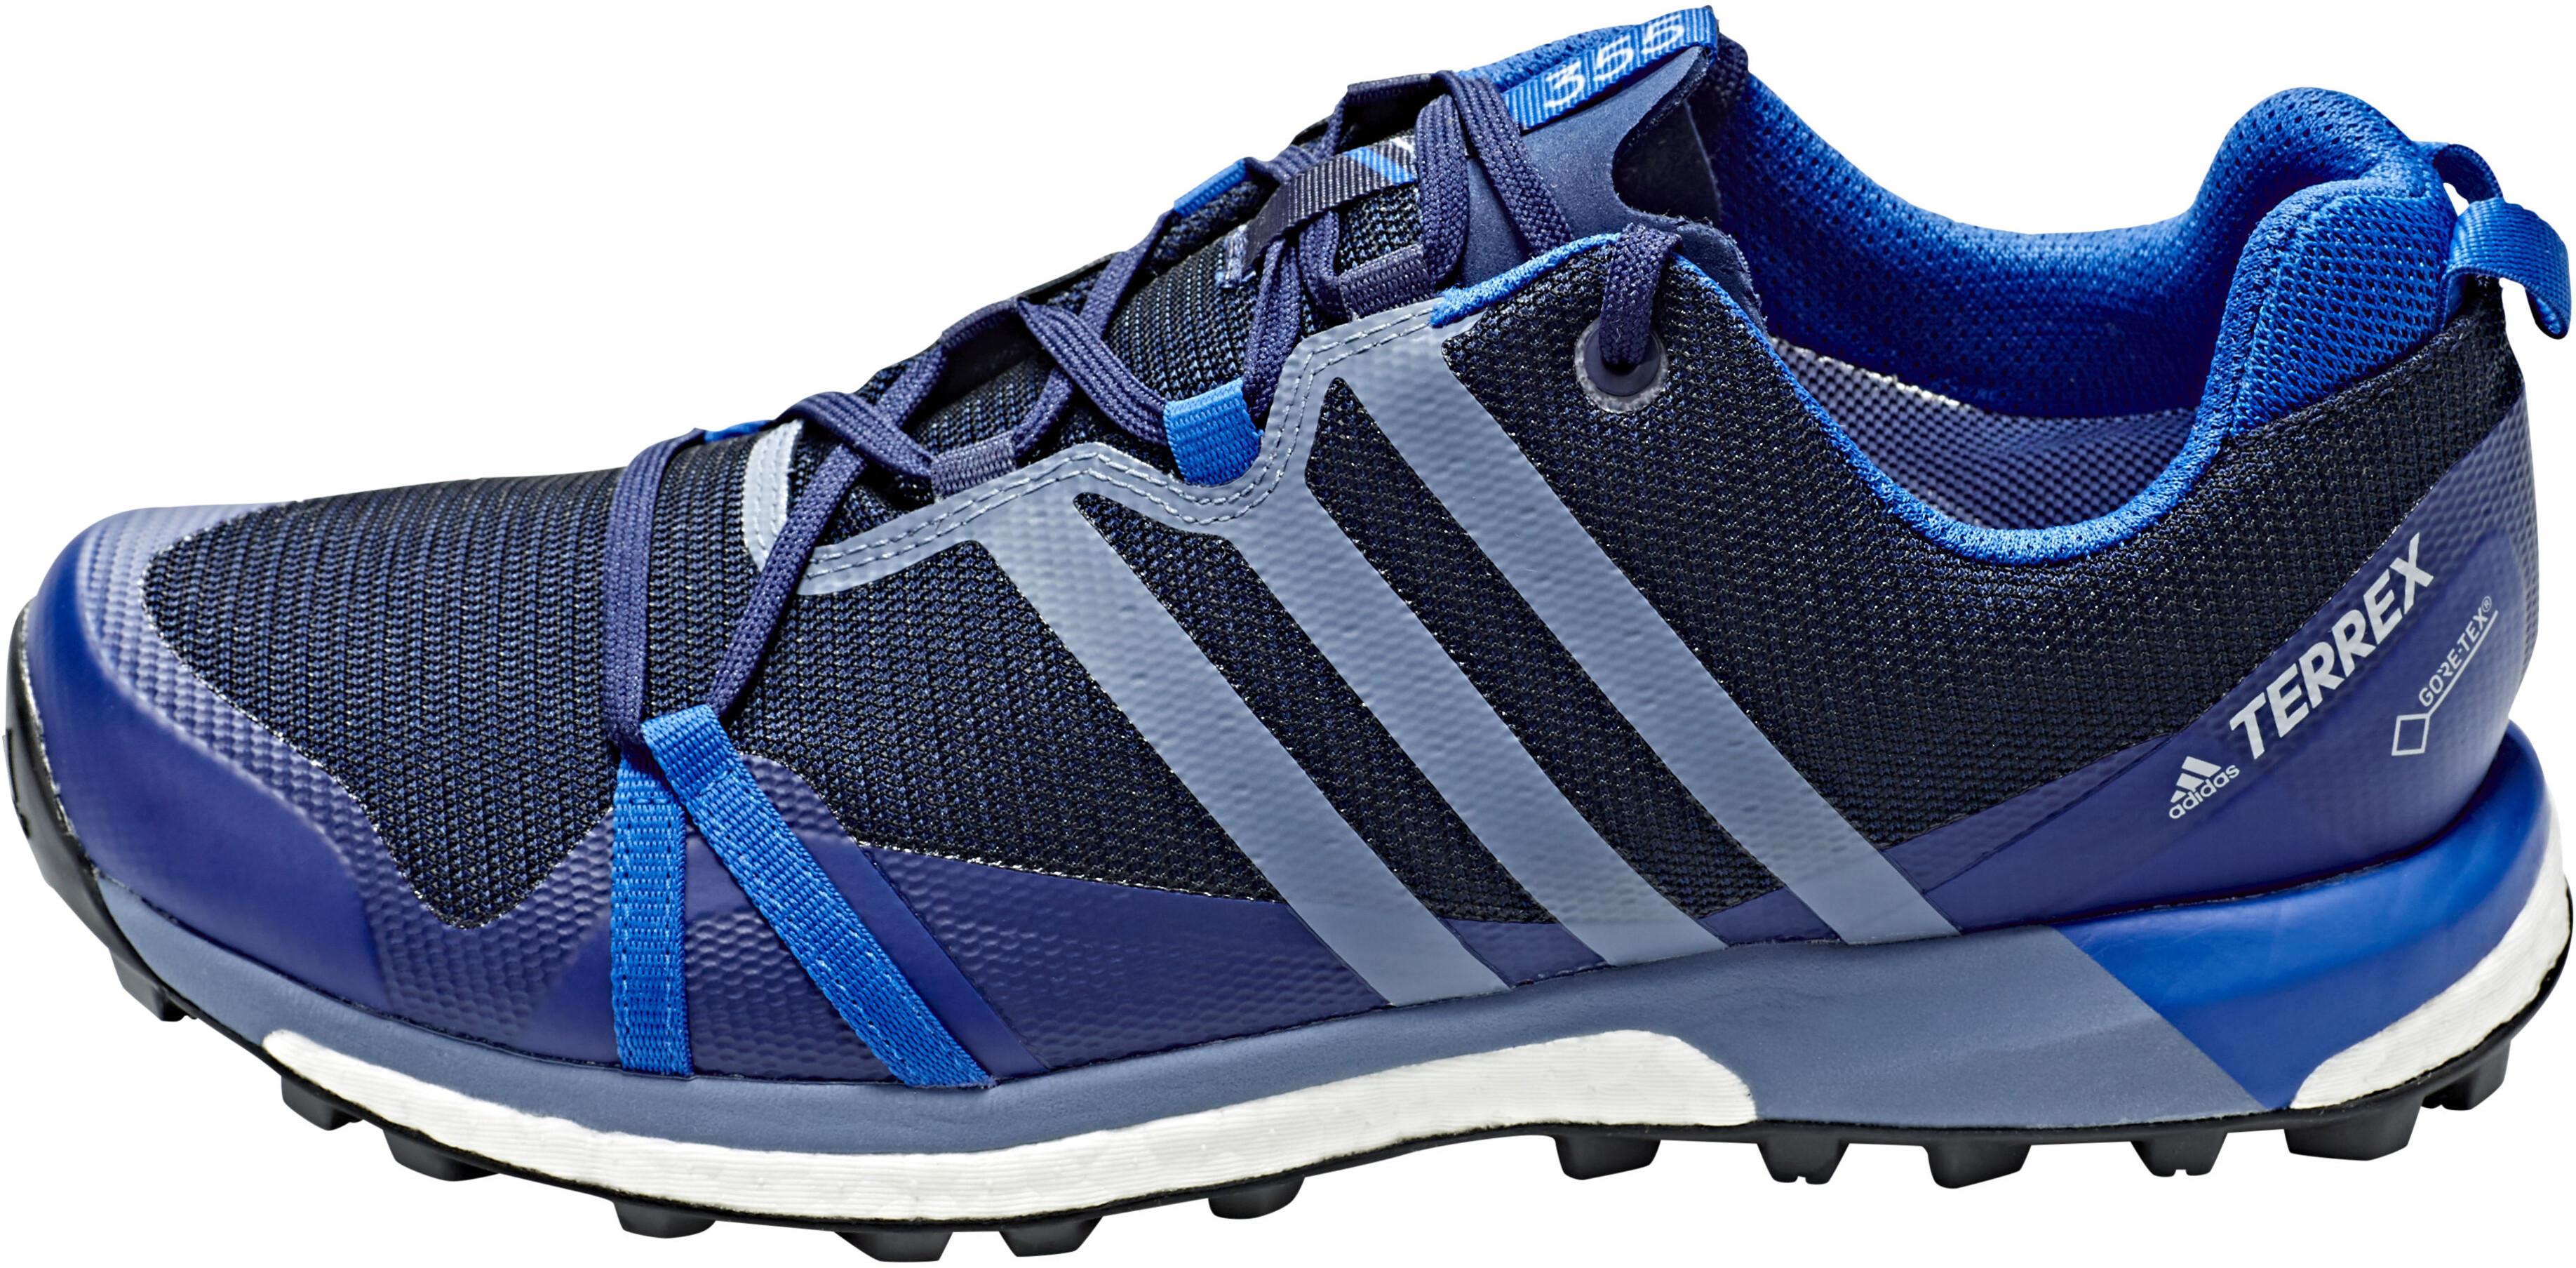 adidas TERREX Agravic GTX Shoes Men collegiate navy raw steel blue beauty 56122c2c2